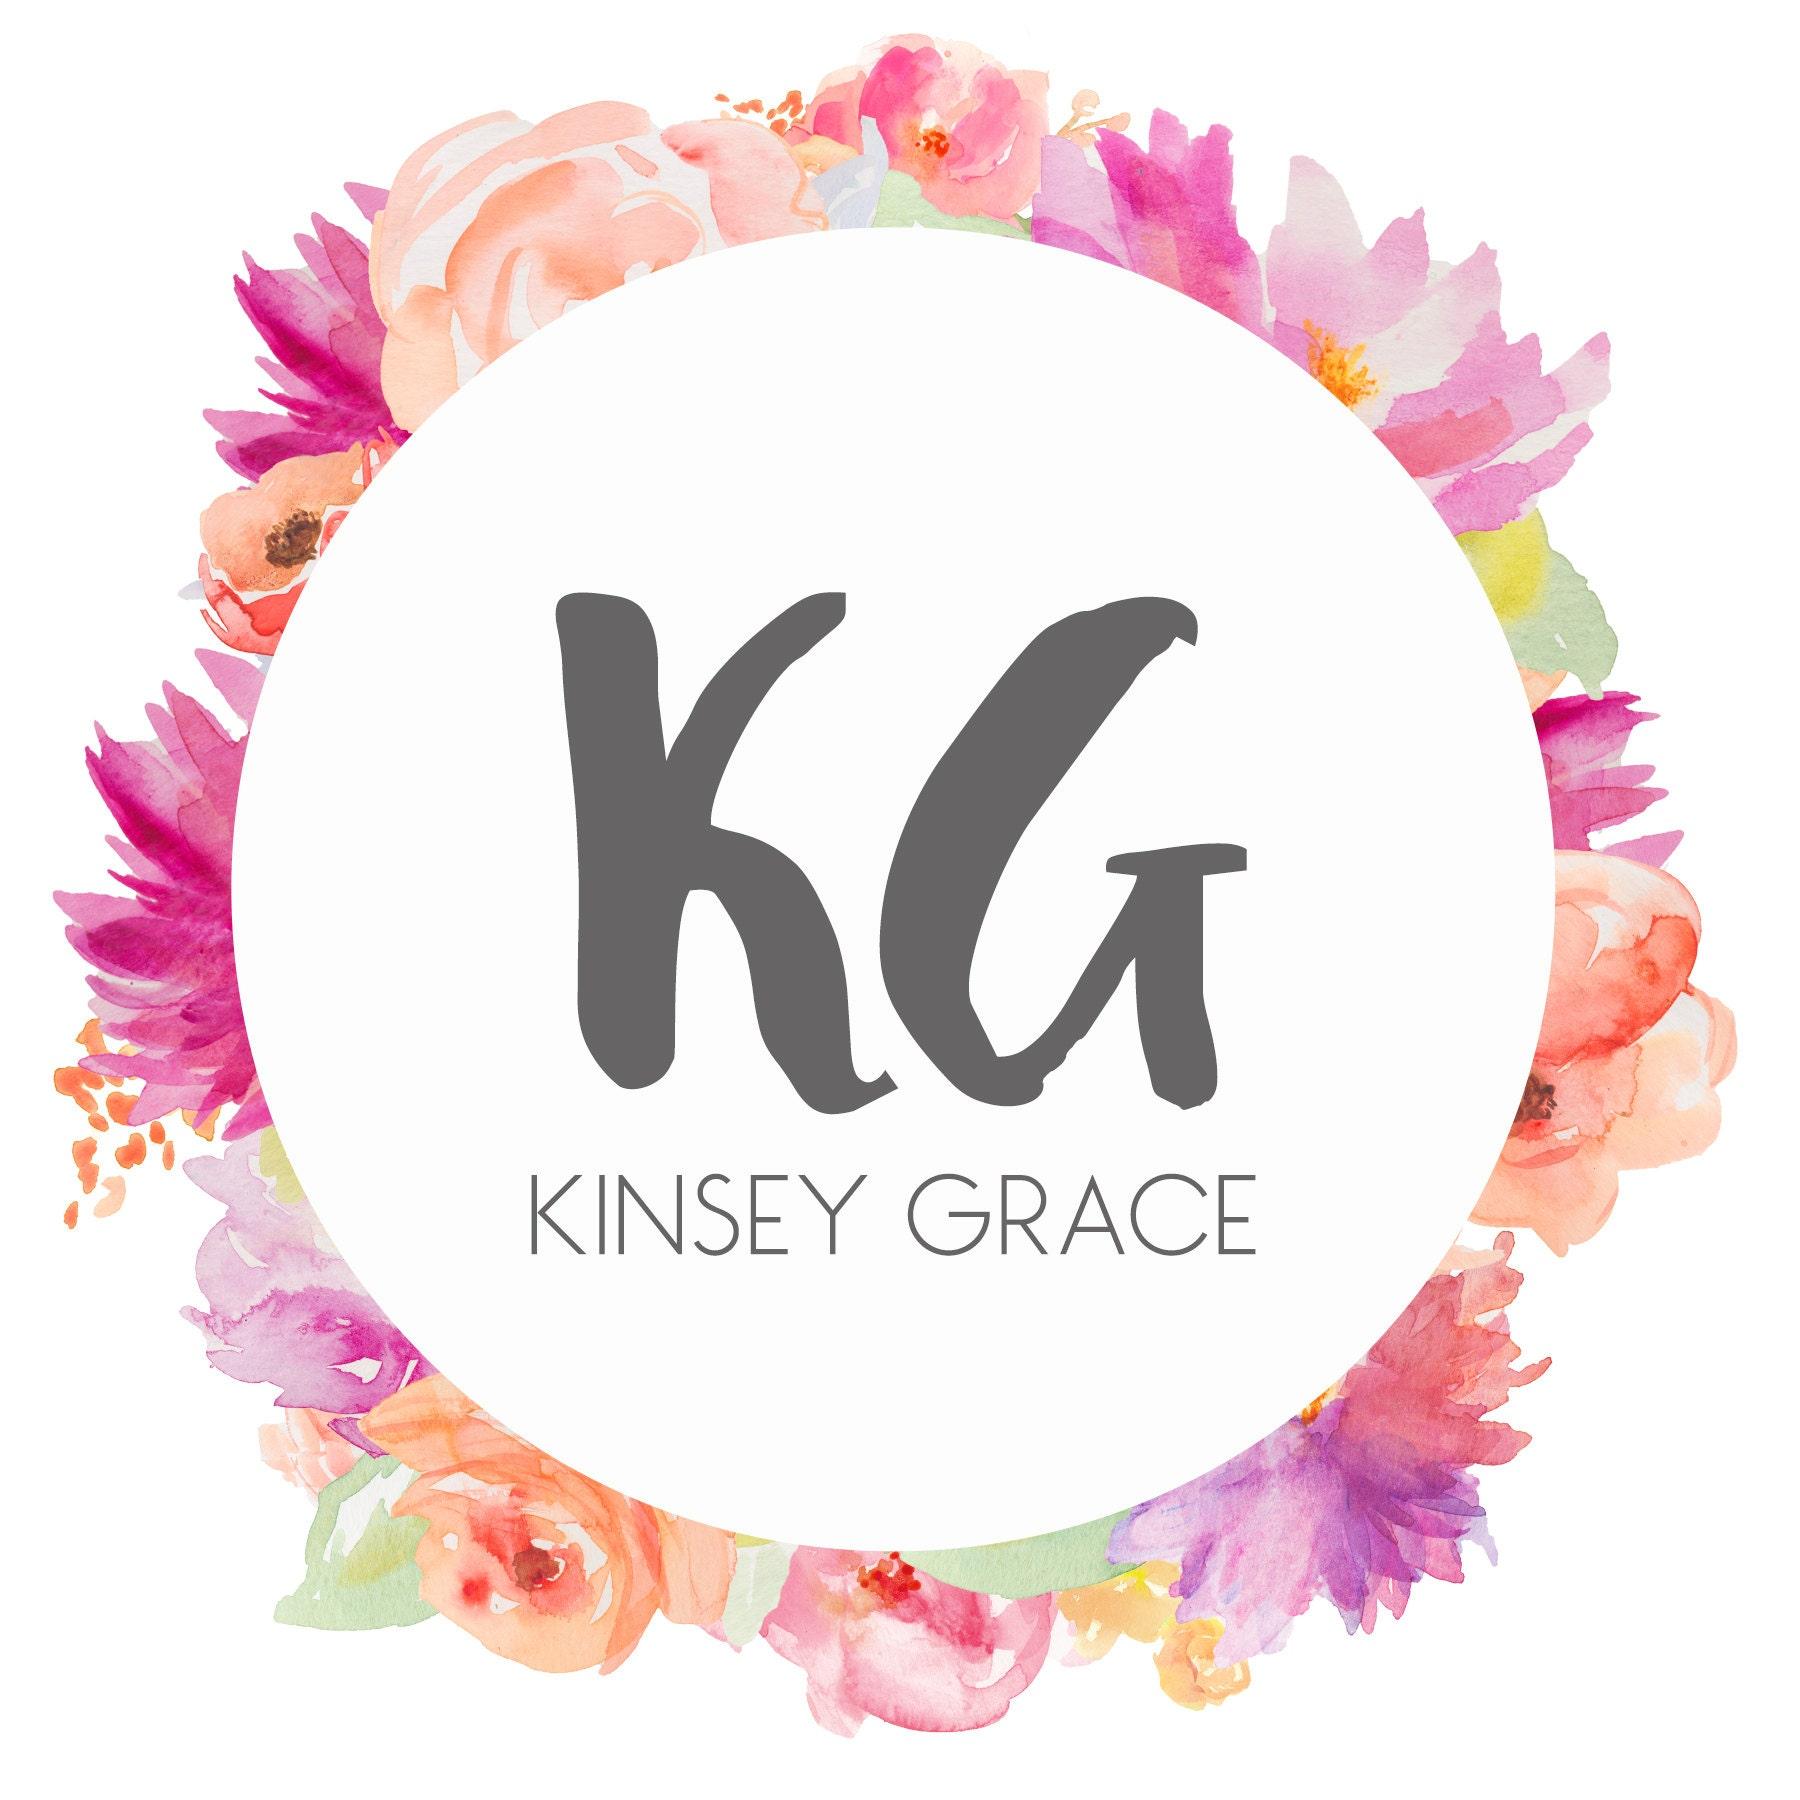 KinseyGraceCo